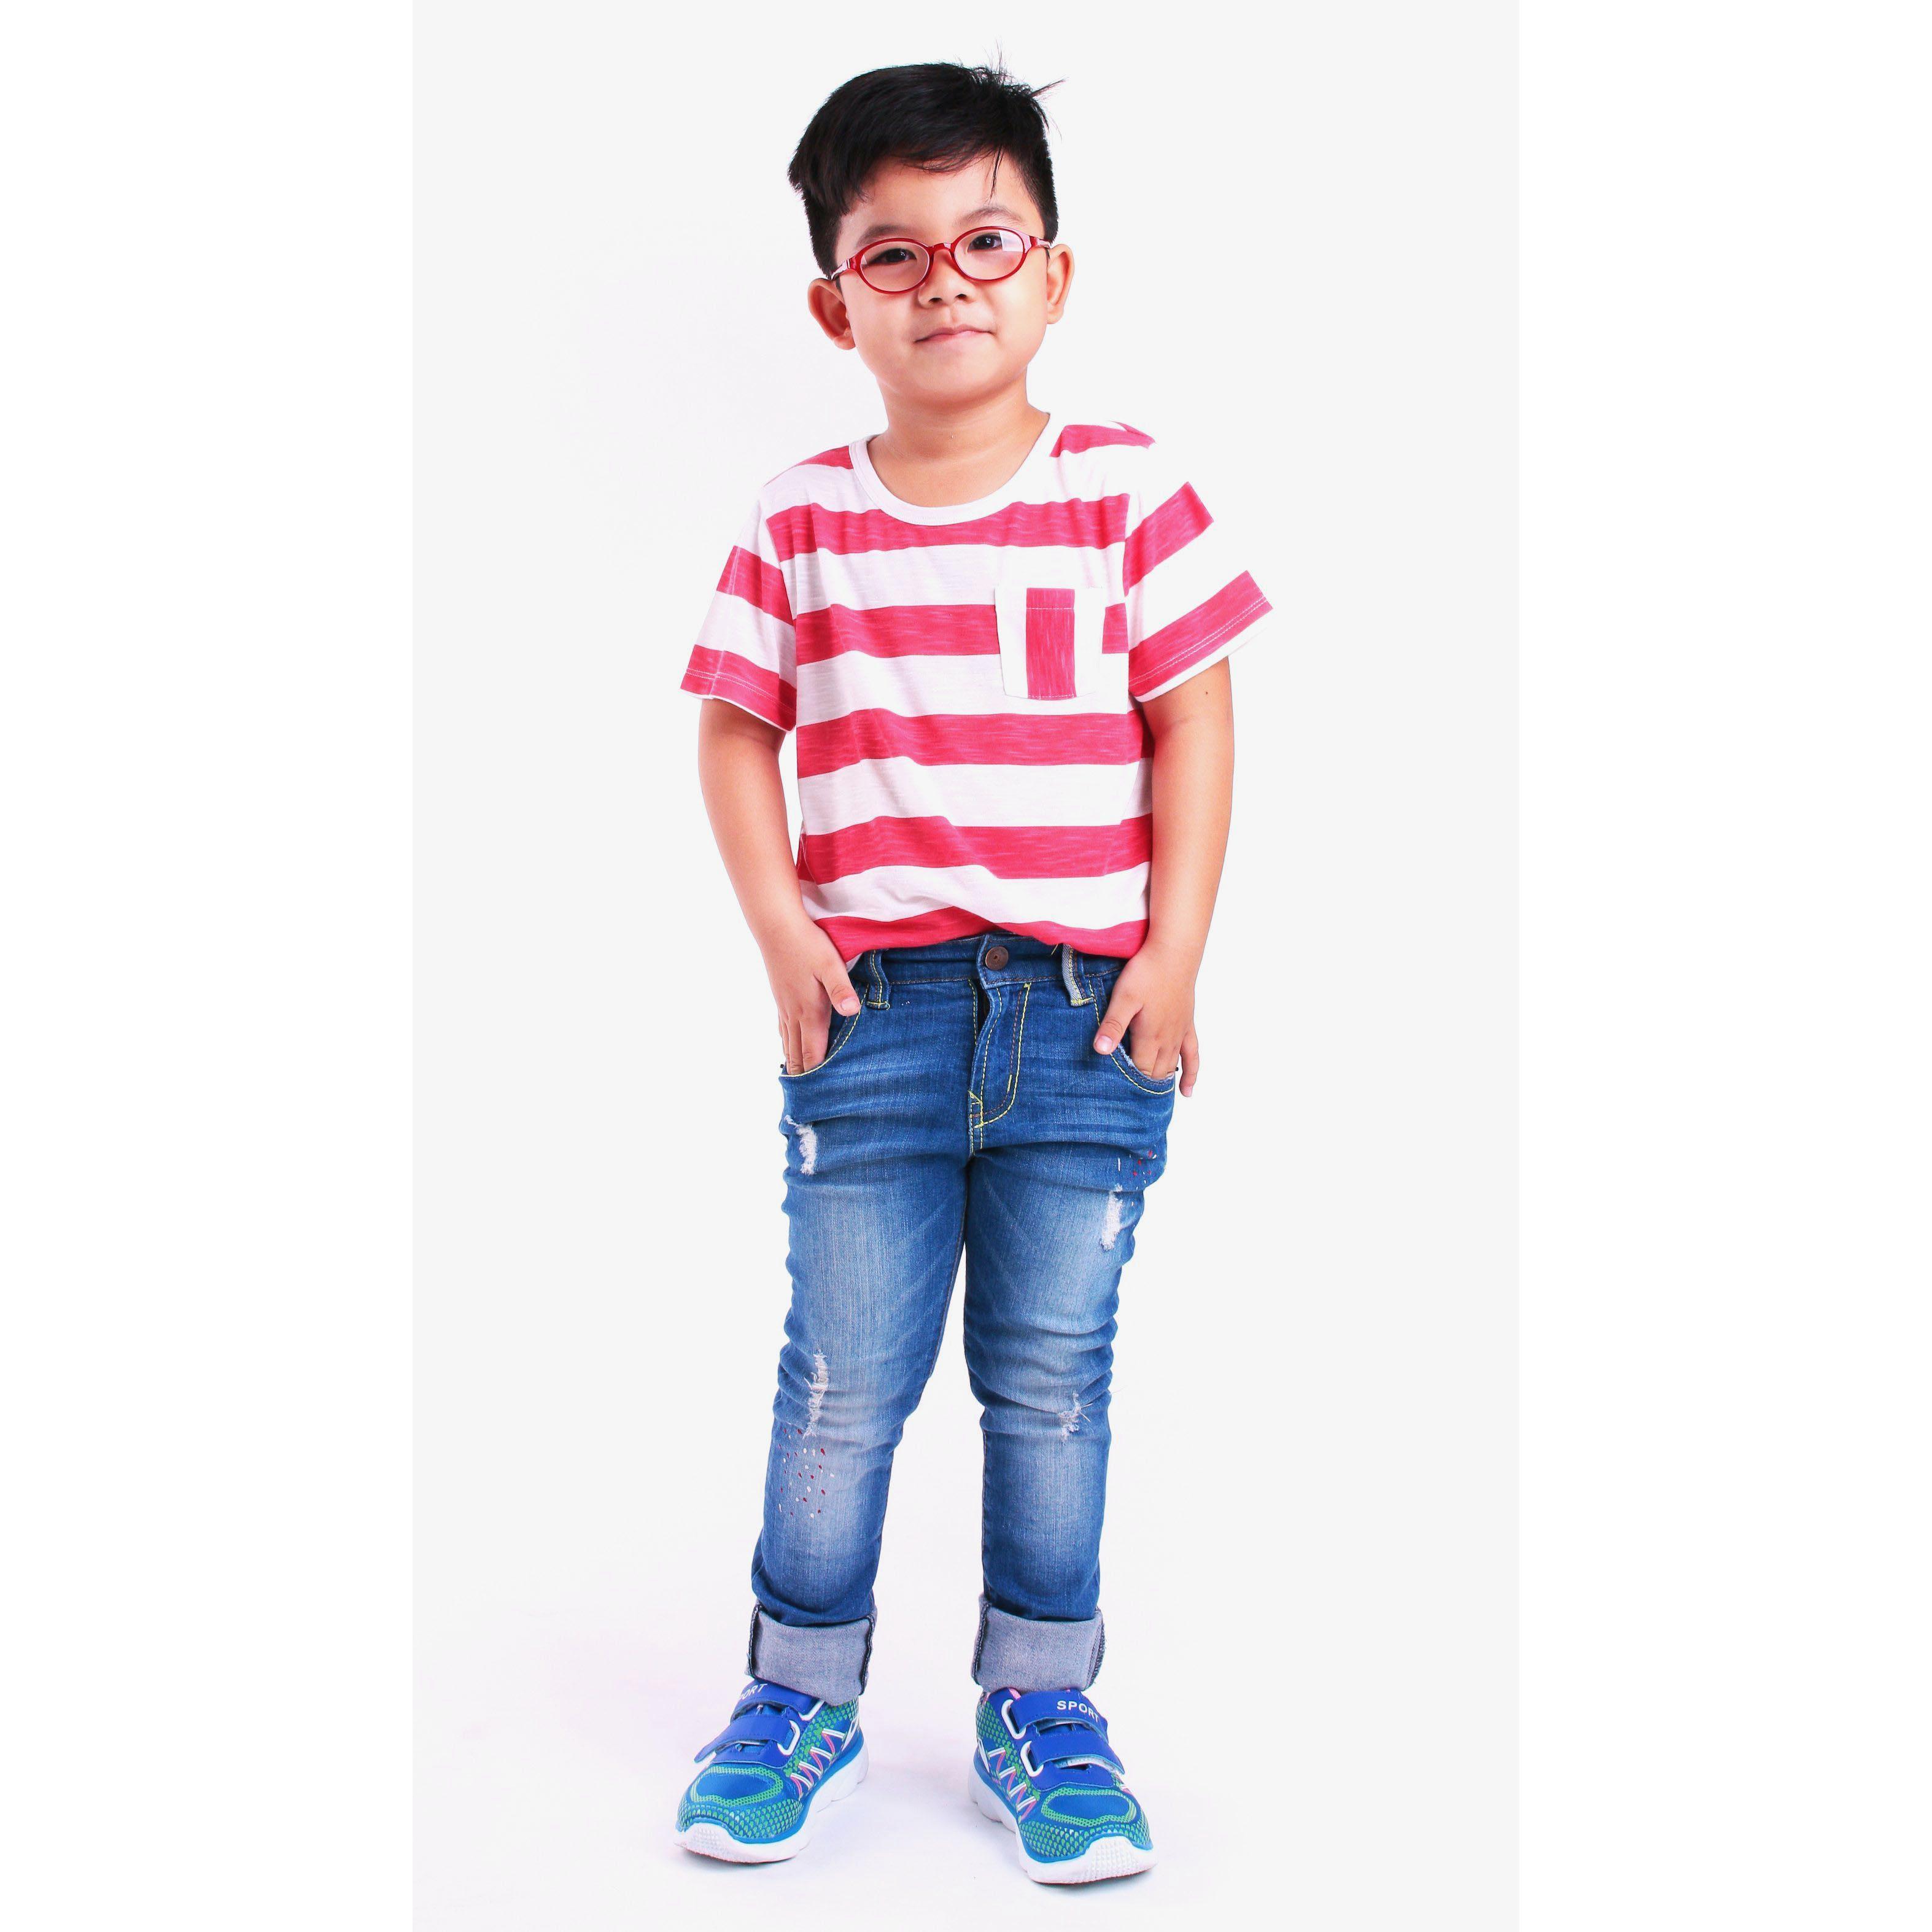 Áo thun bé trai Ugether UKID57 (Sọc đỏ)